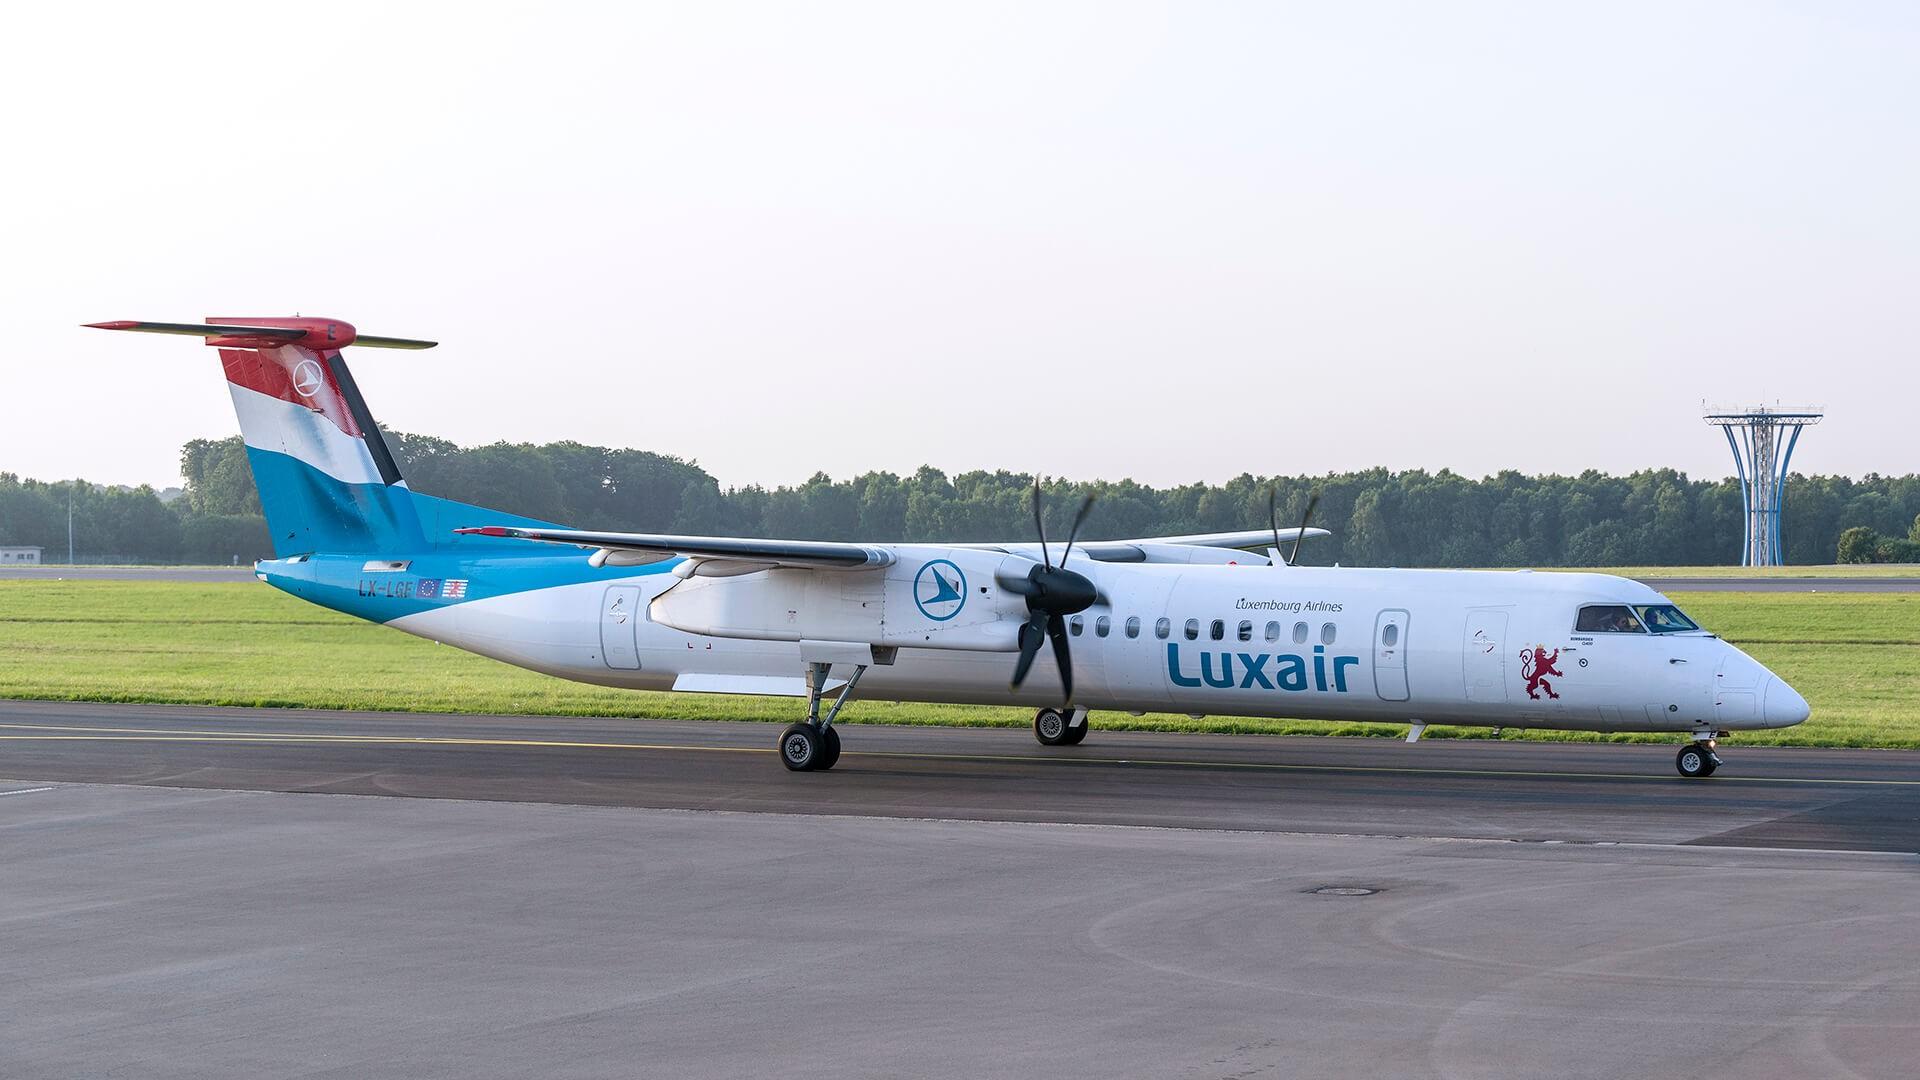 Luxair menja red letenja ka Beogradu i Podgorici